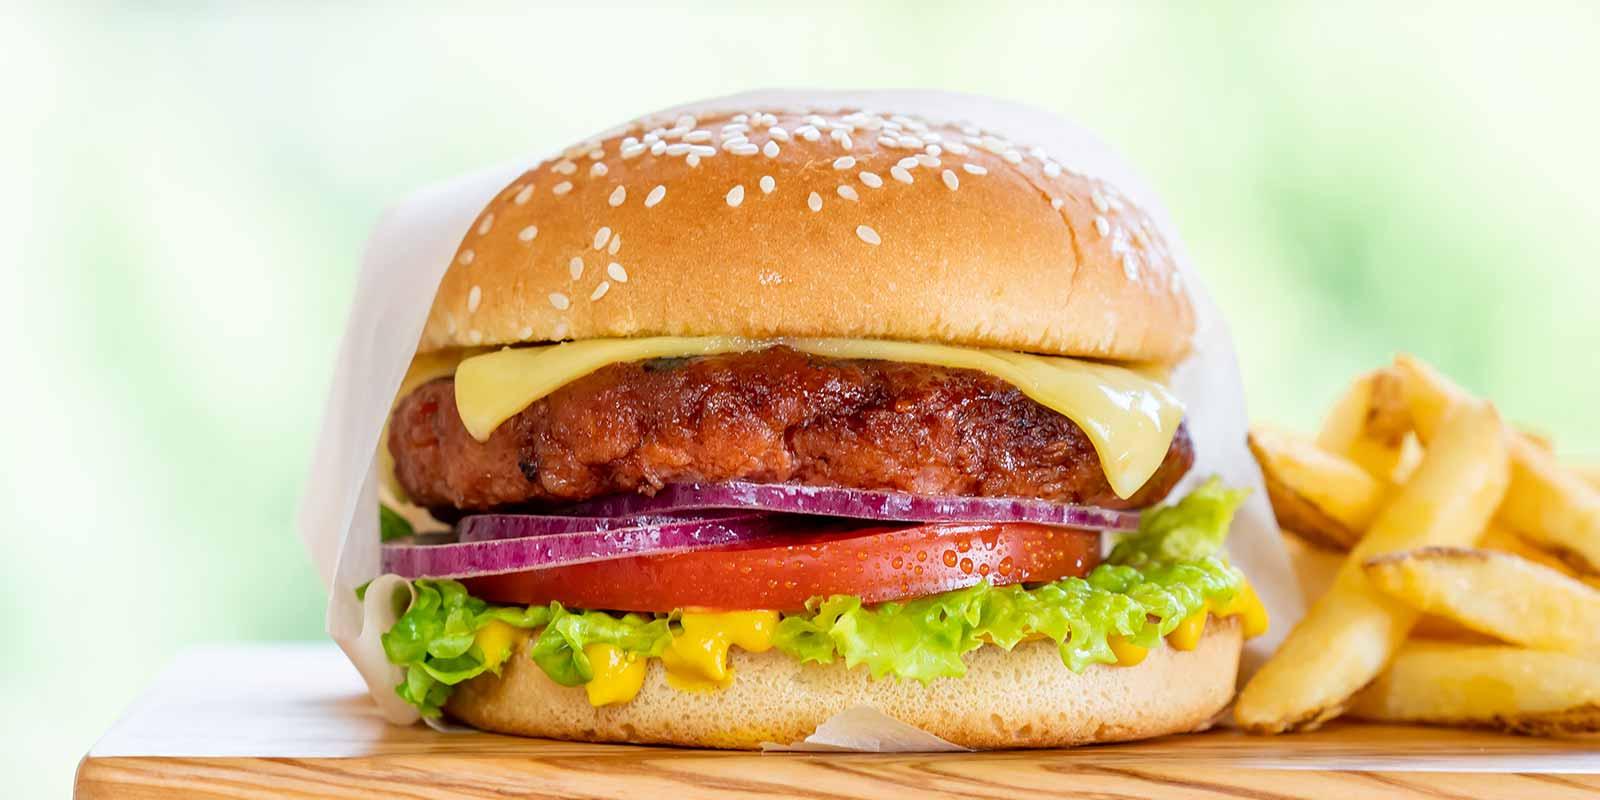 Classic Plant-Based Cheeseburger